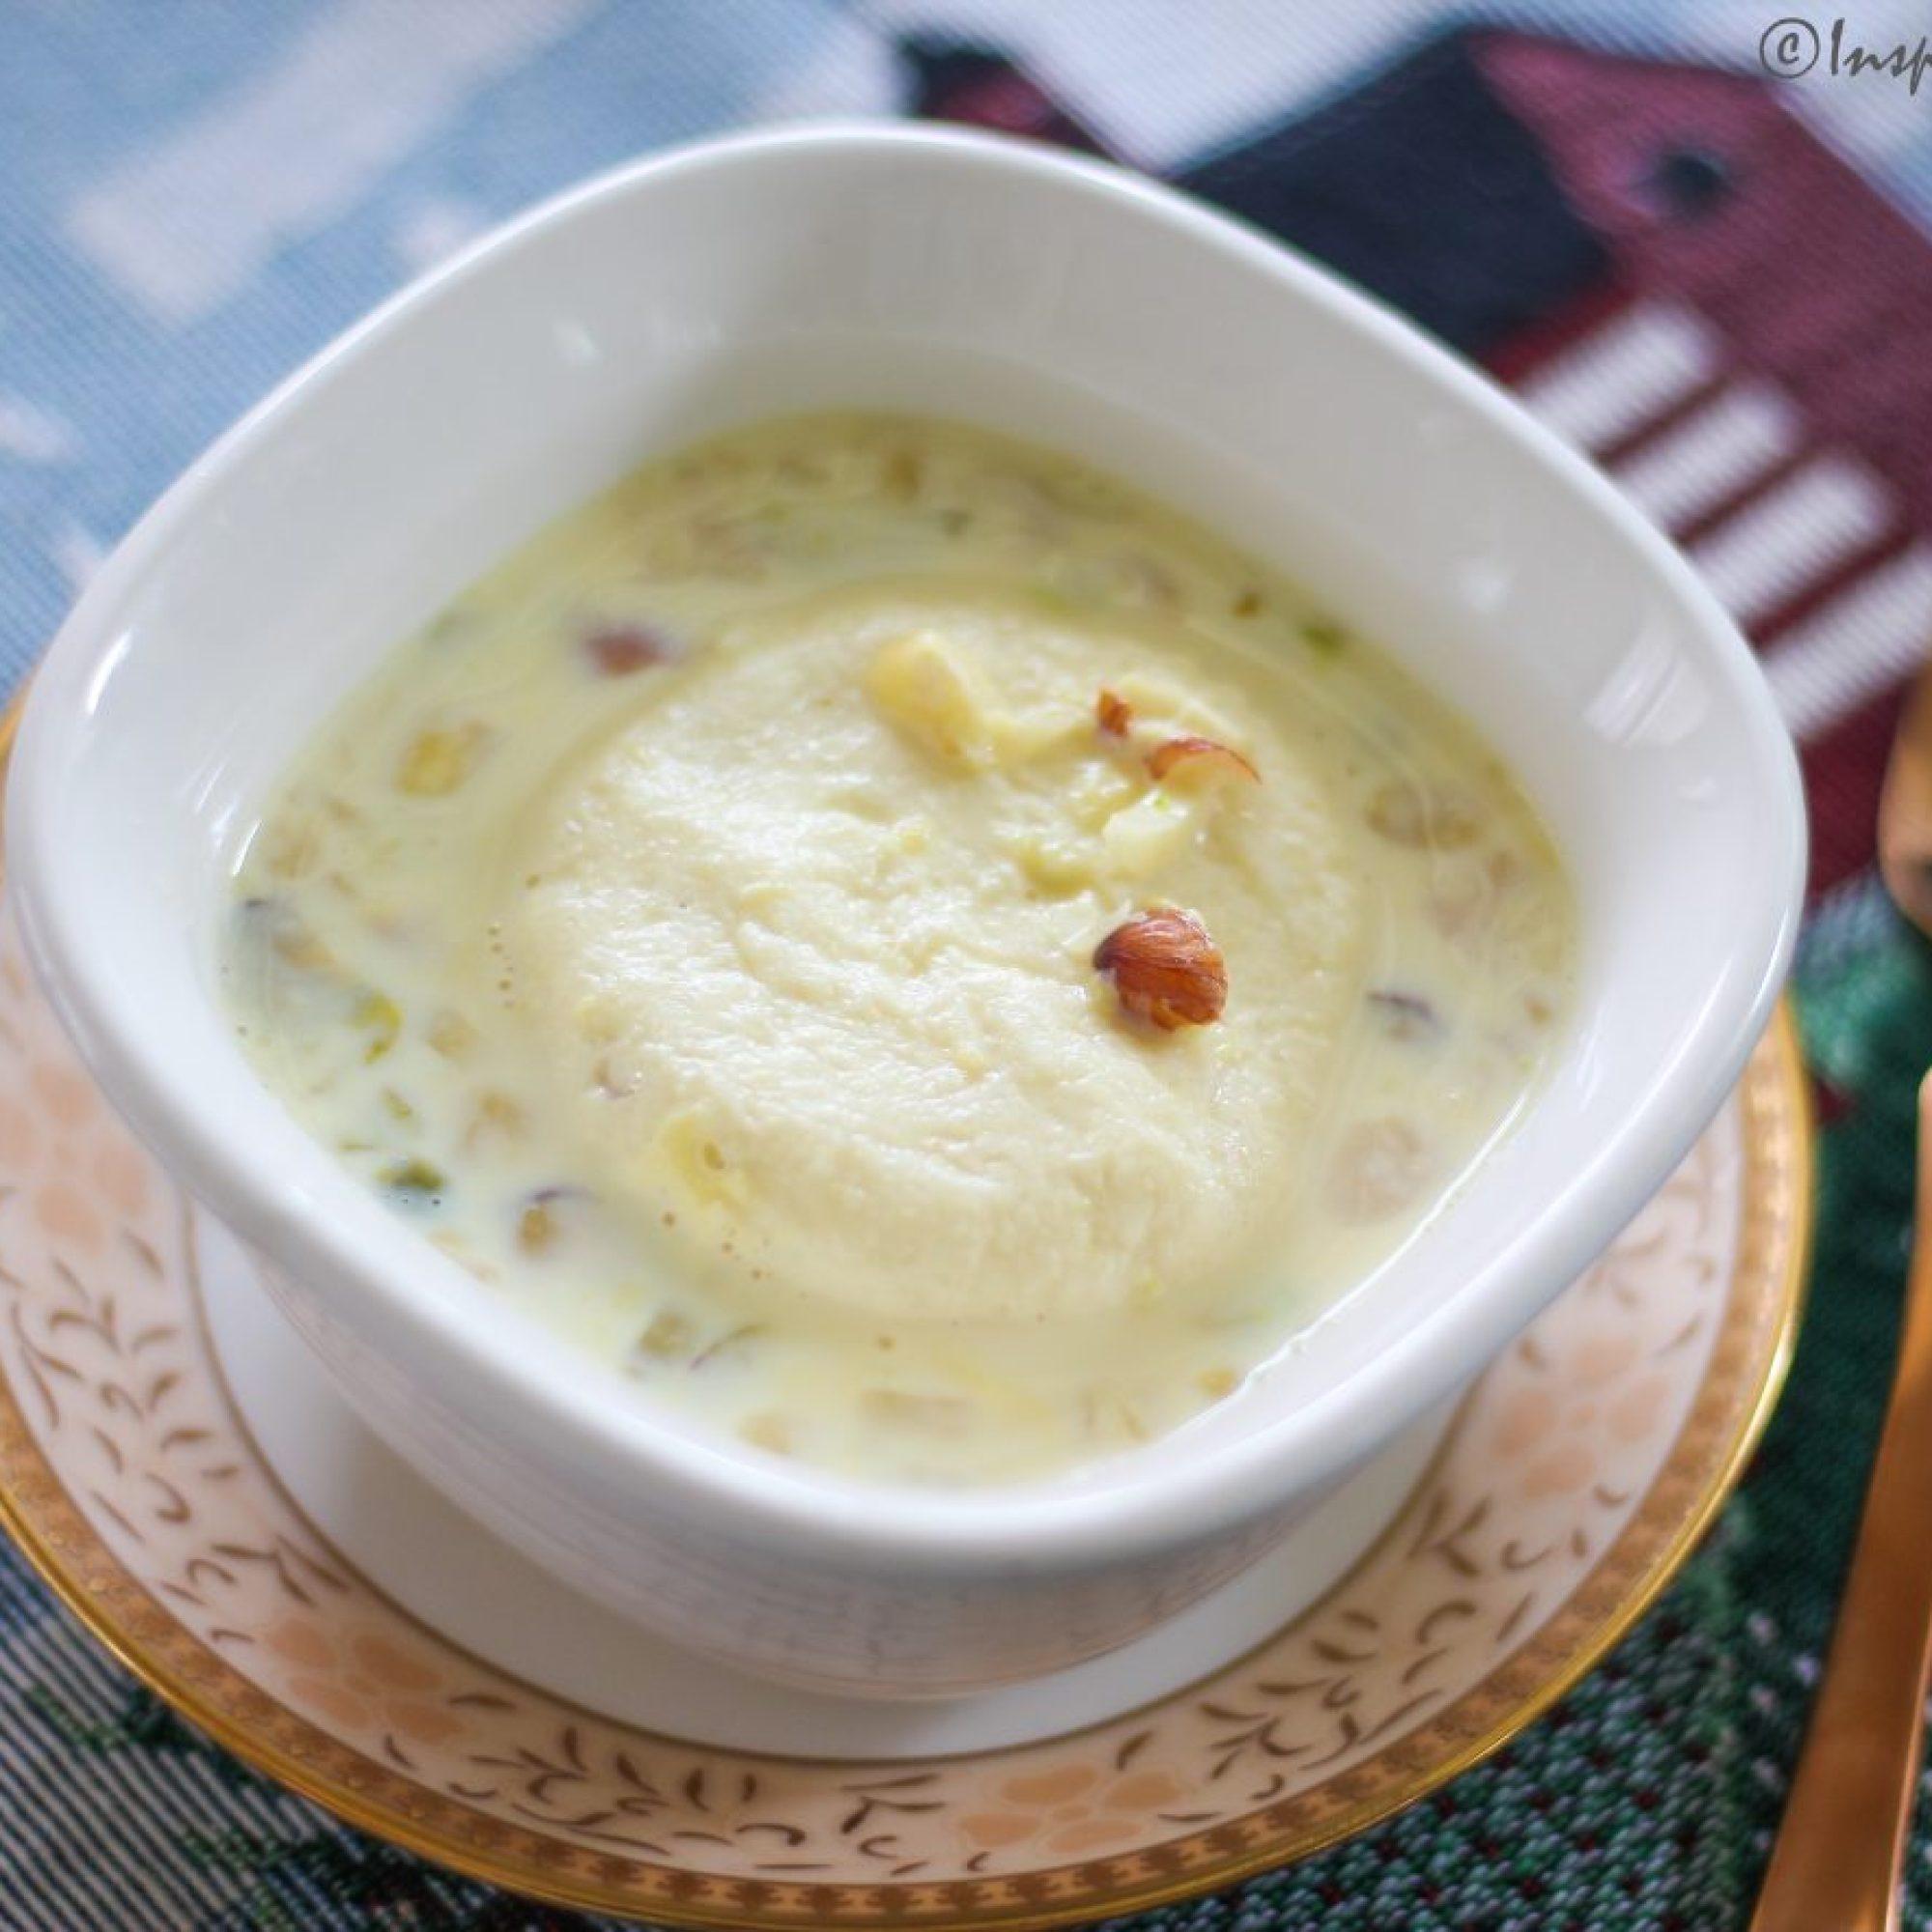 Rasmalai - Cottage cheese in flavored milk